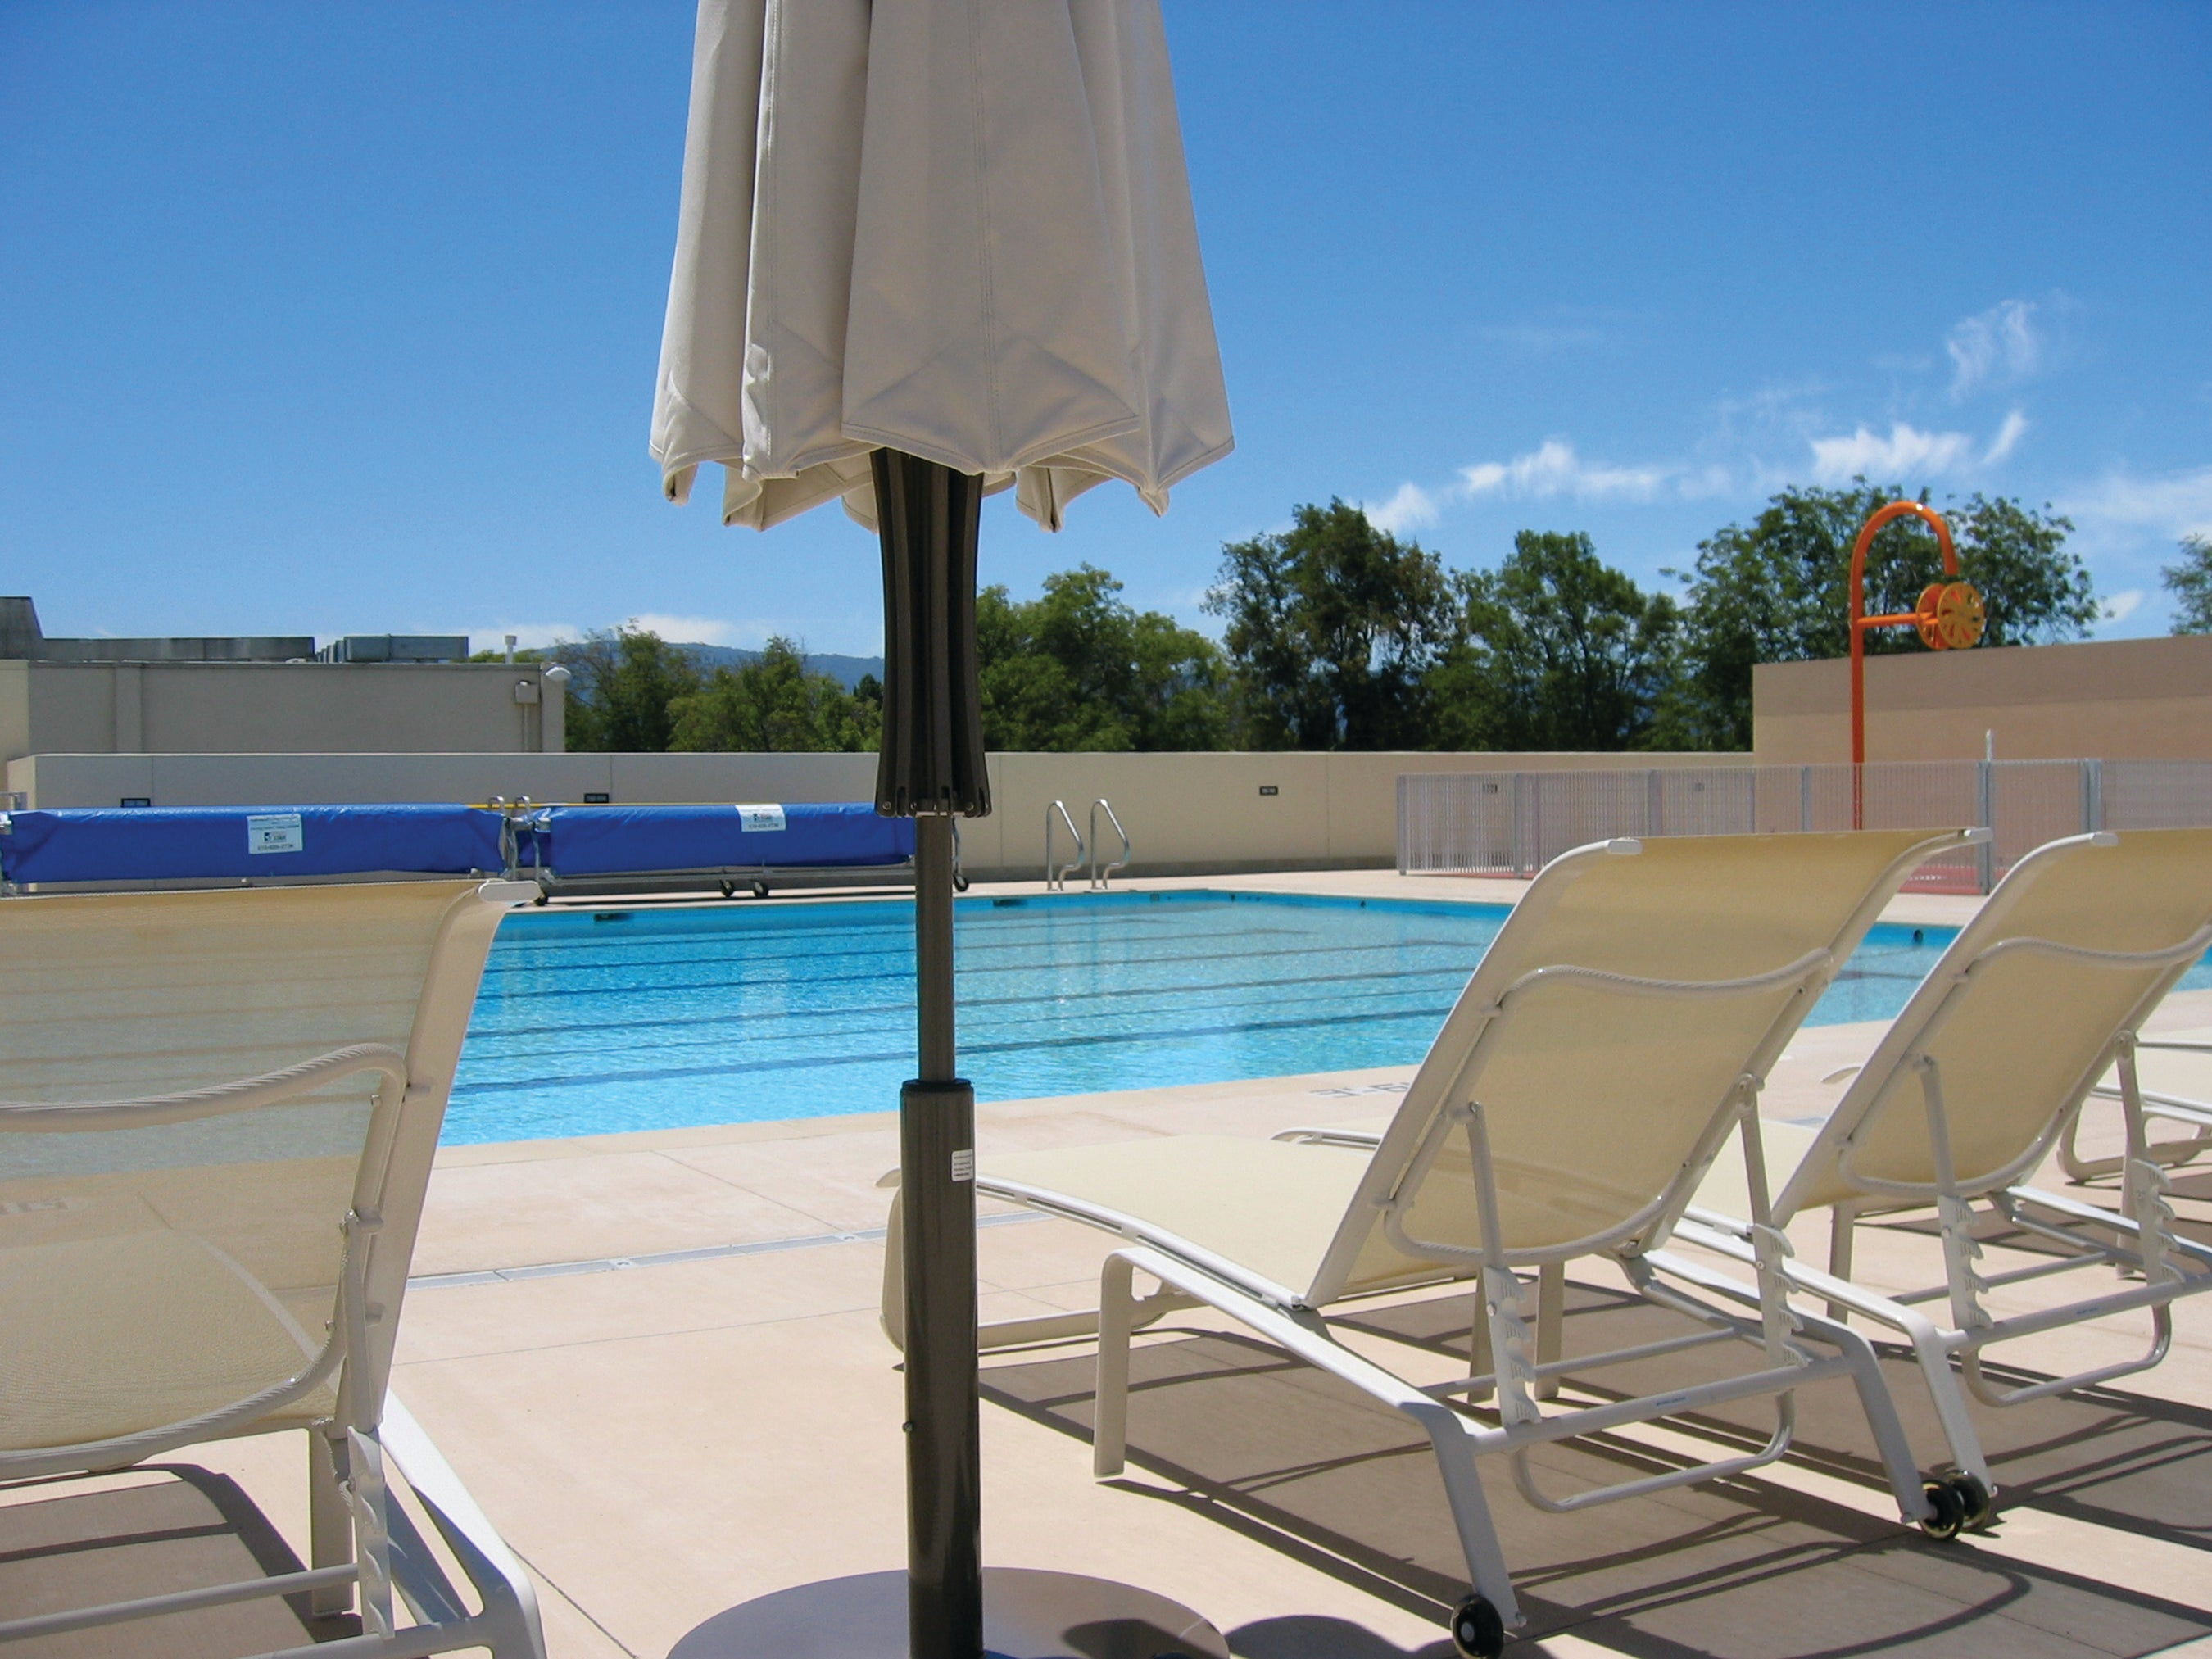 Oshman family jcc san jose tickets schedule seating - Palo alto ymca swimming pool schedule ...